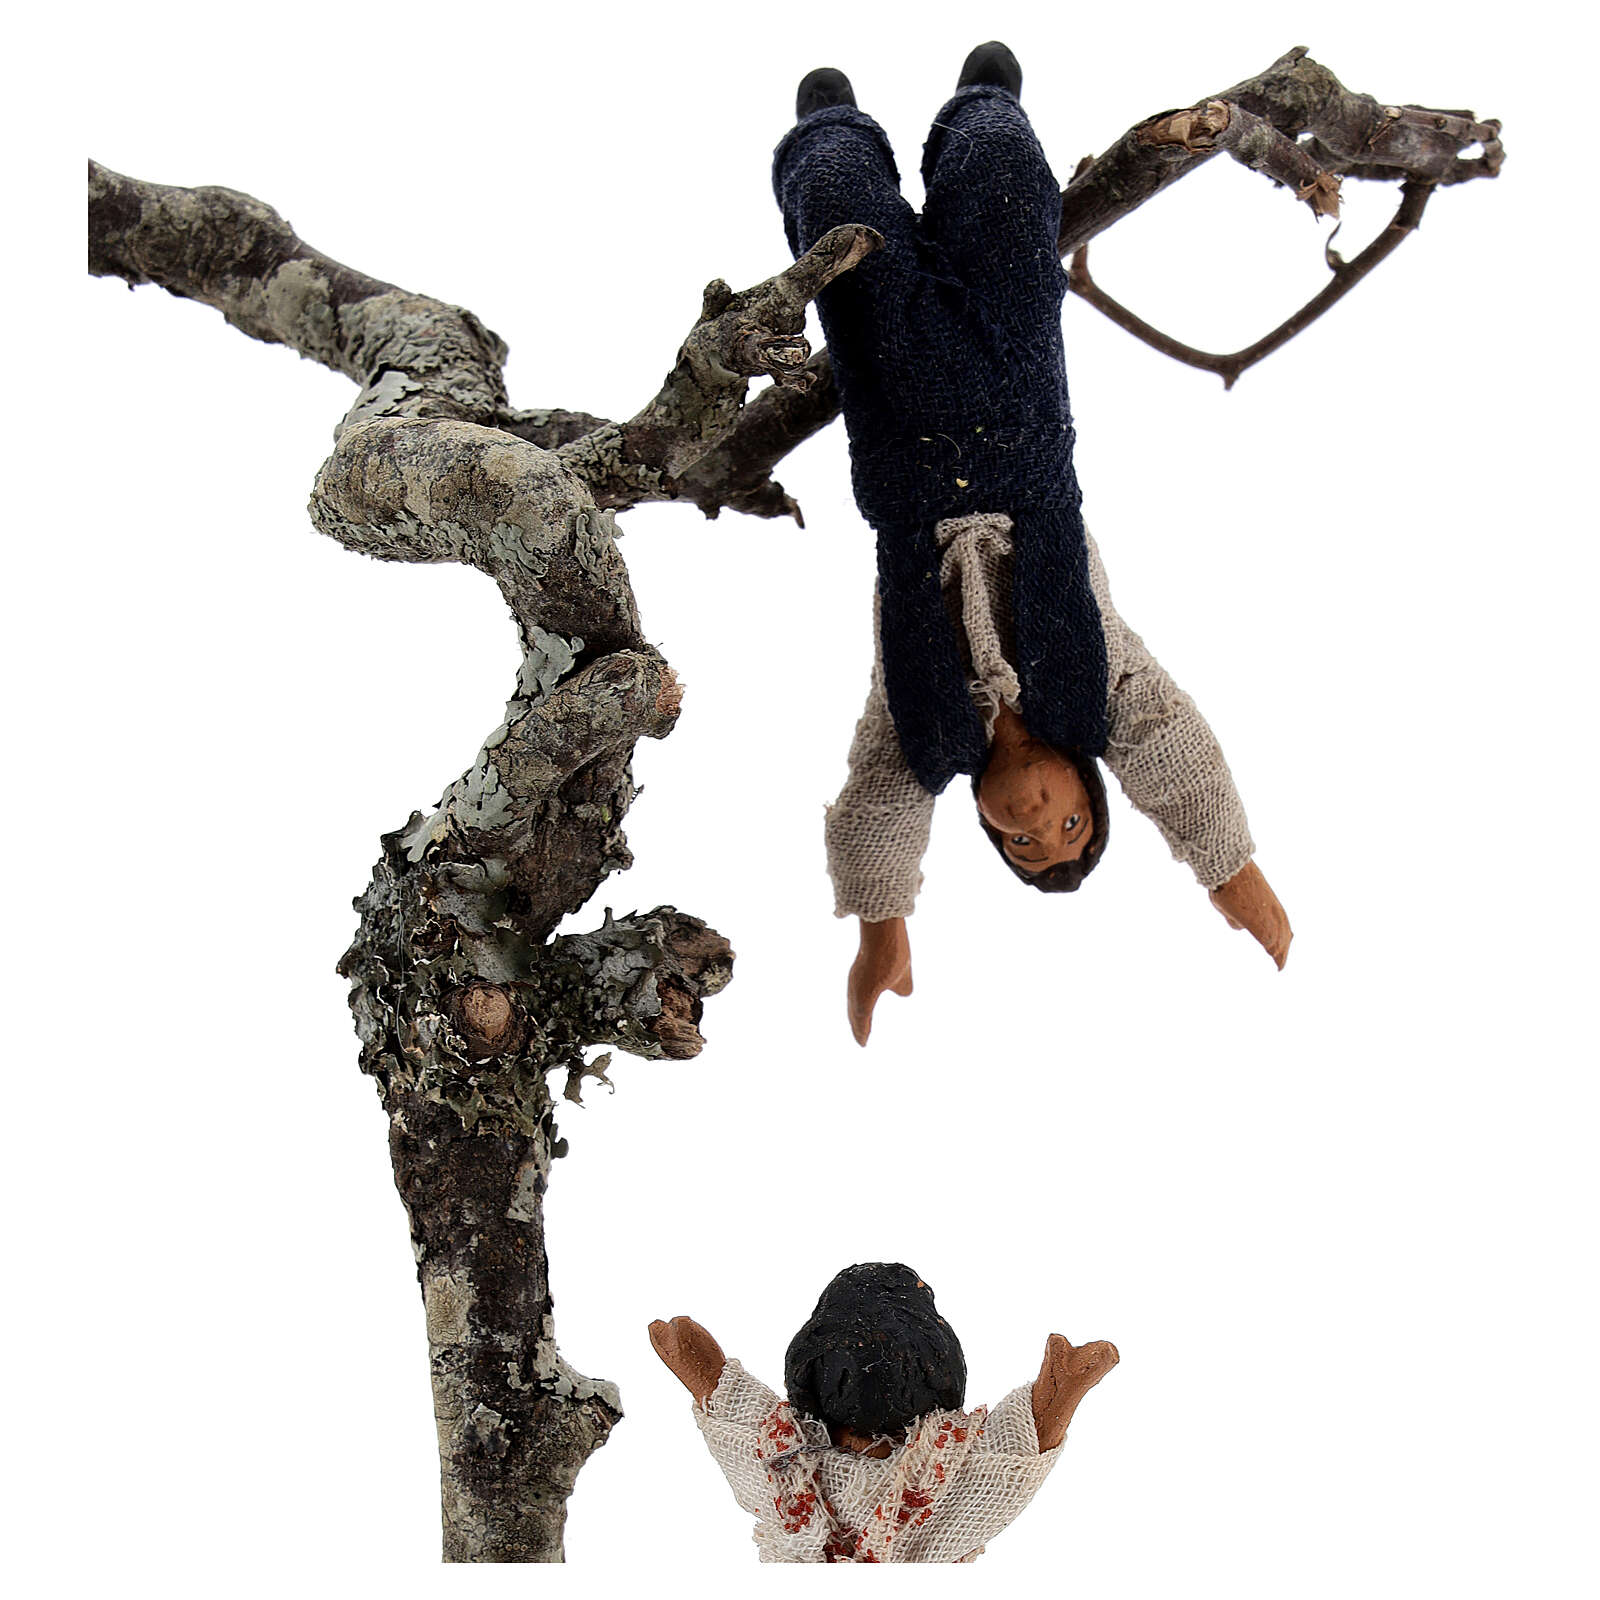 Children playing on tree figurine, 13 cm Neapolitan nativity scene 4